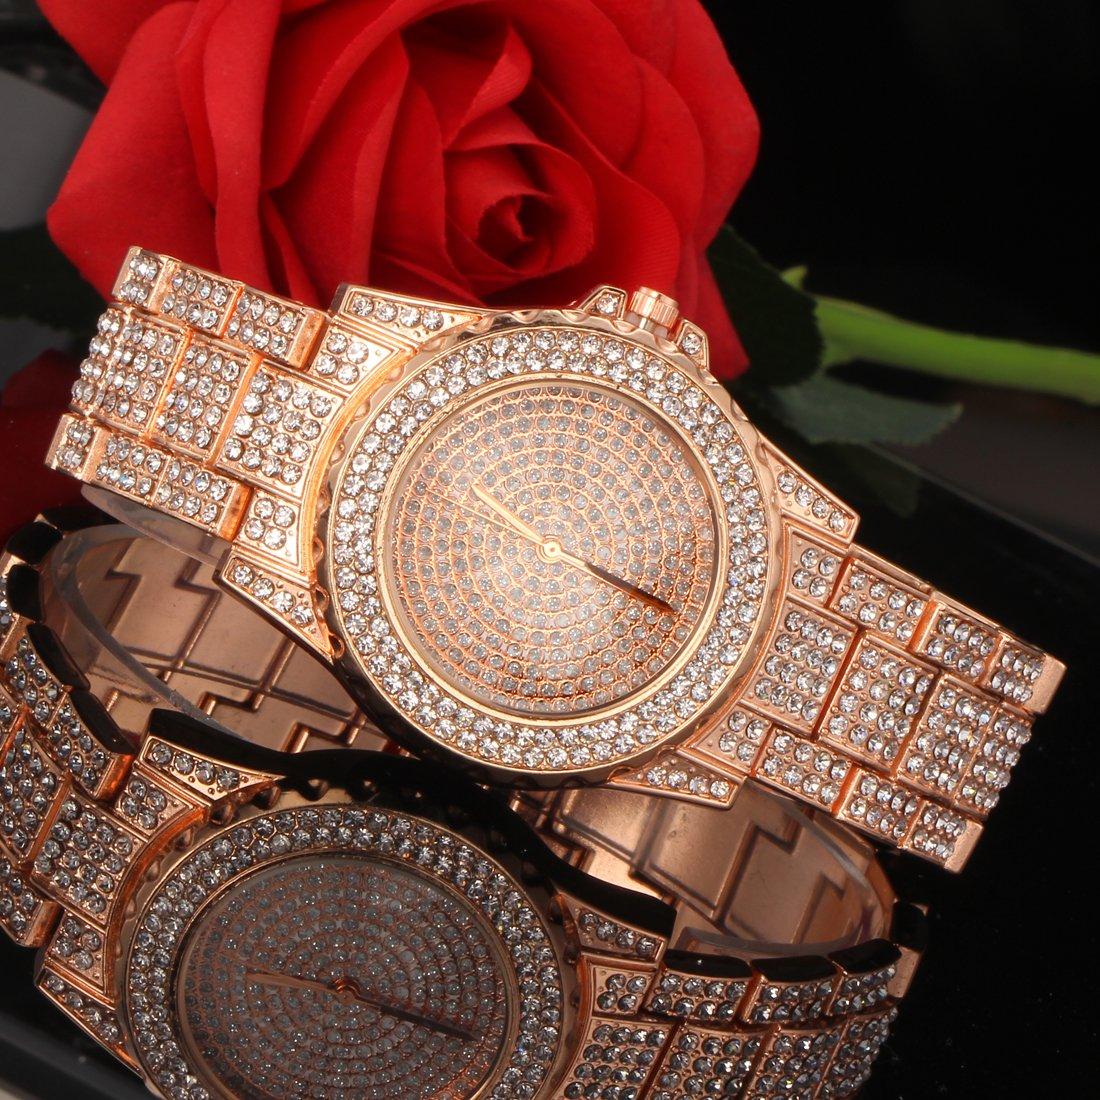 Amazon.com: SINOBI Iced Out Reloj de cuarzo de diamante ...